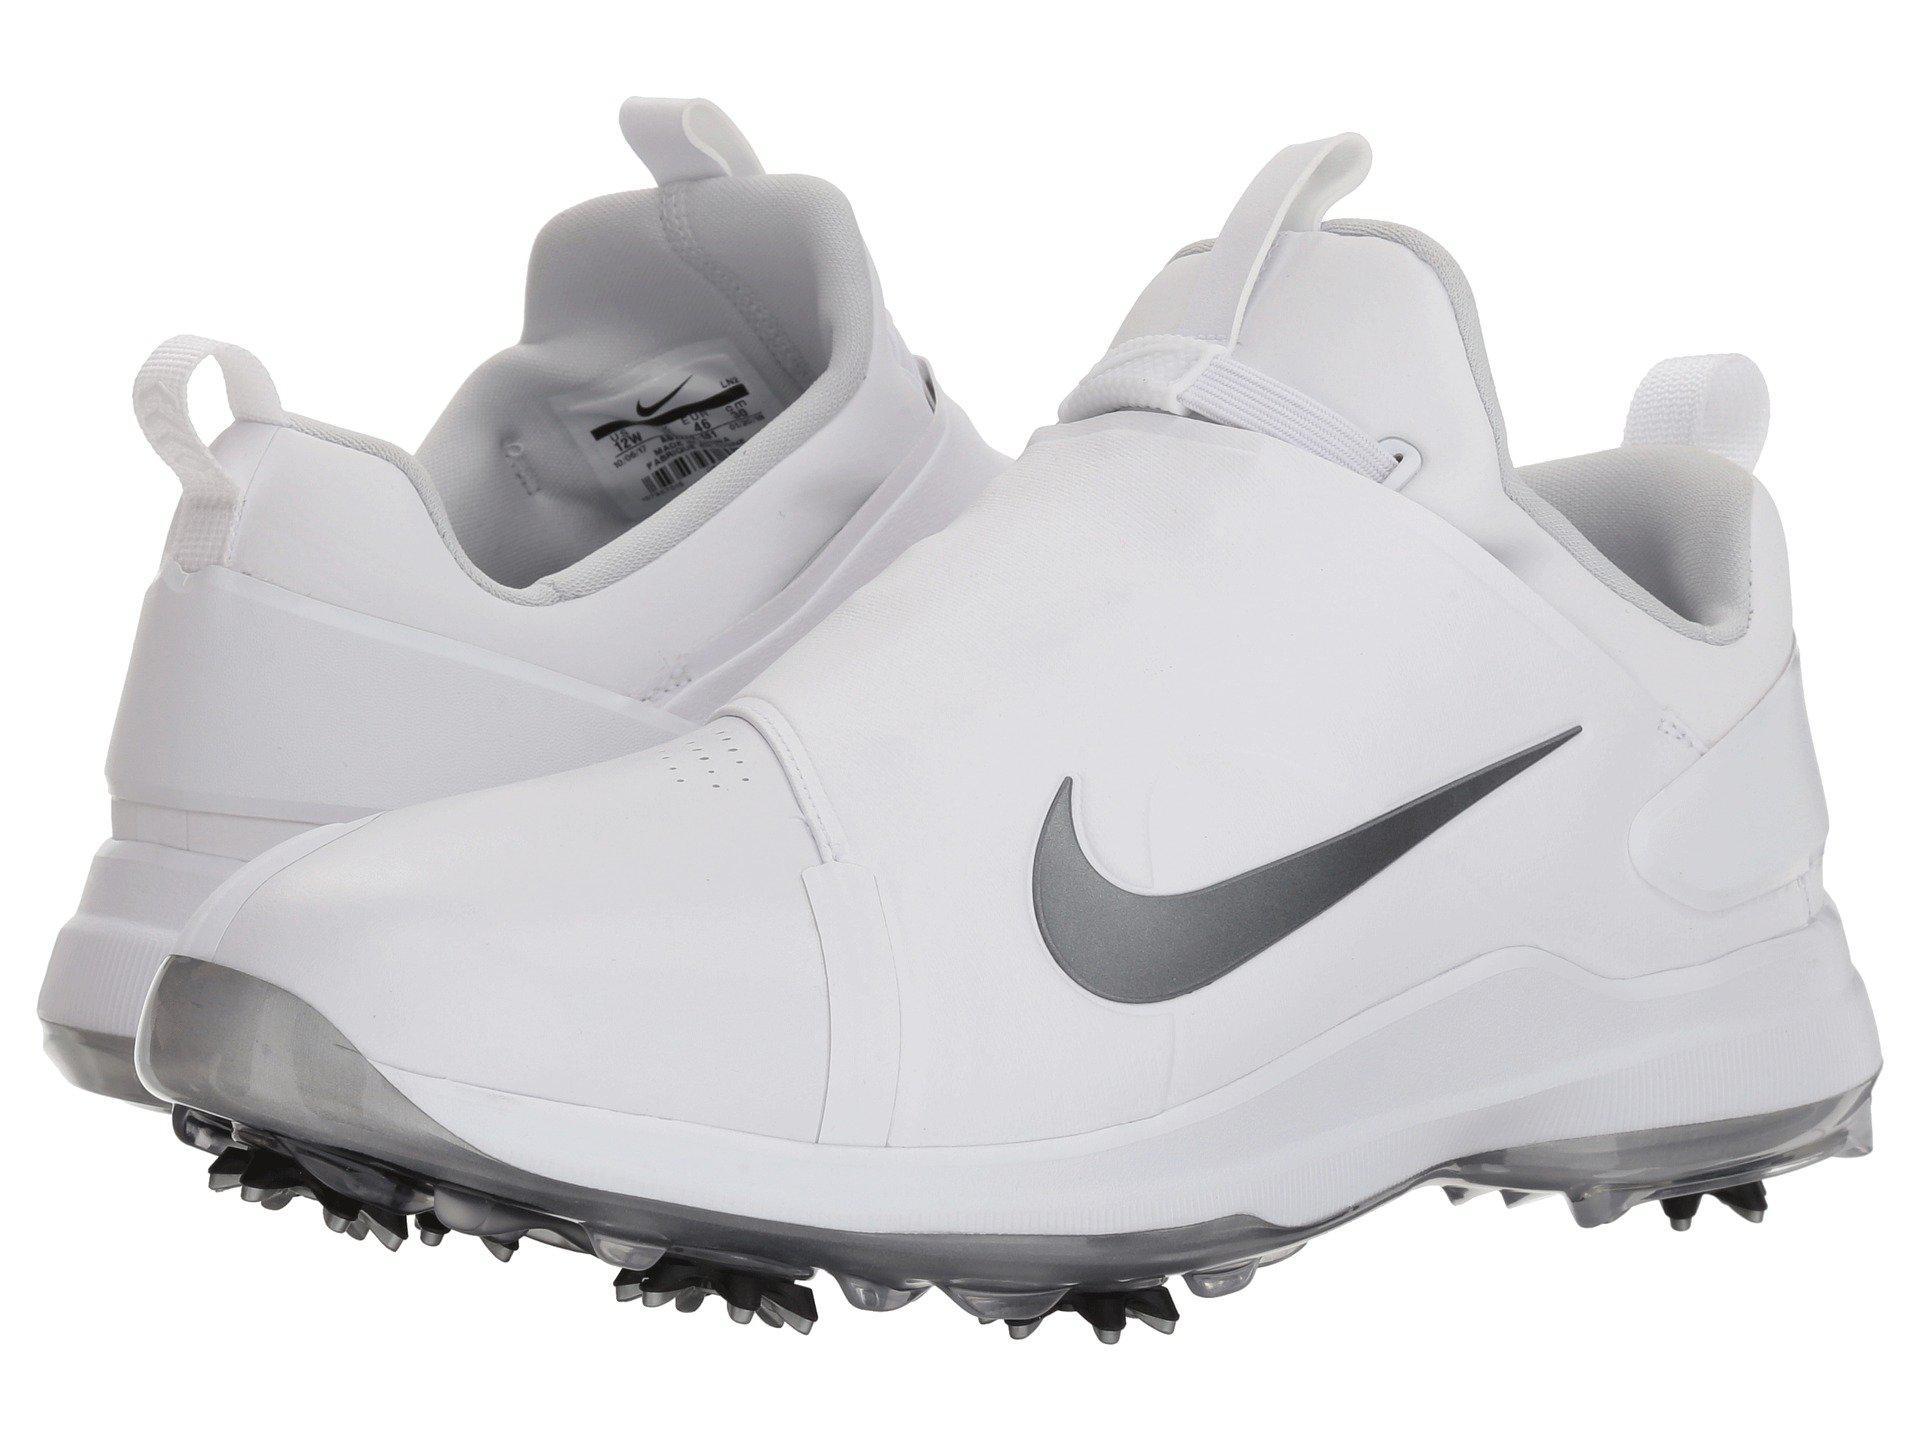 e18bfdbc384f Nike. Tour Premier (black metallic Silver anthracite) Men s Golf Shoes